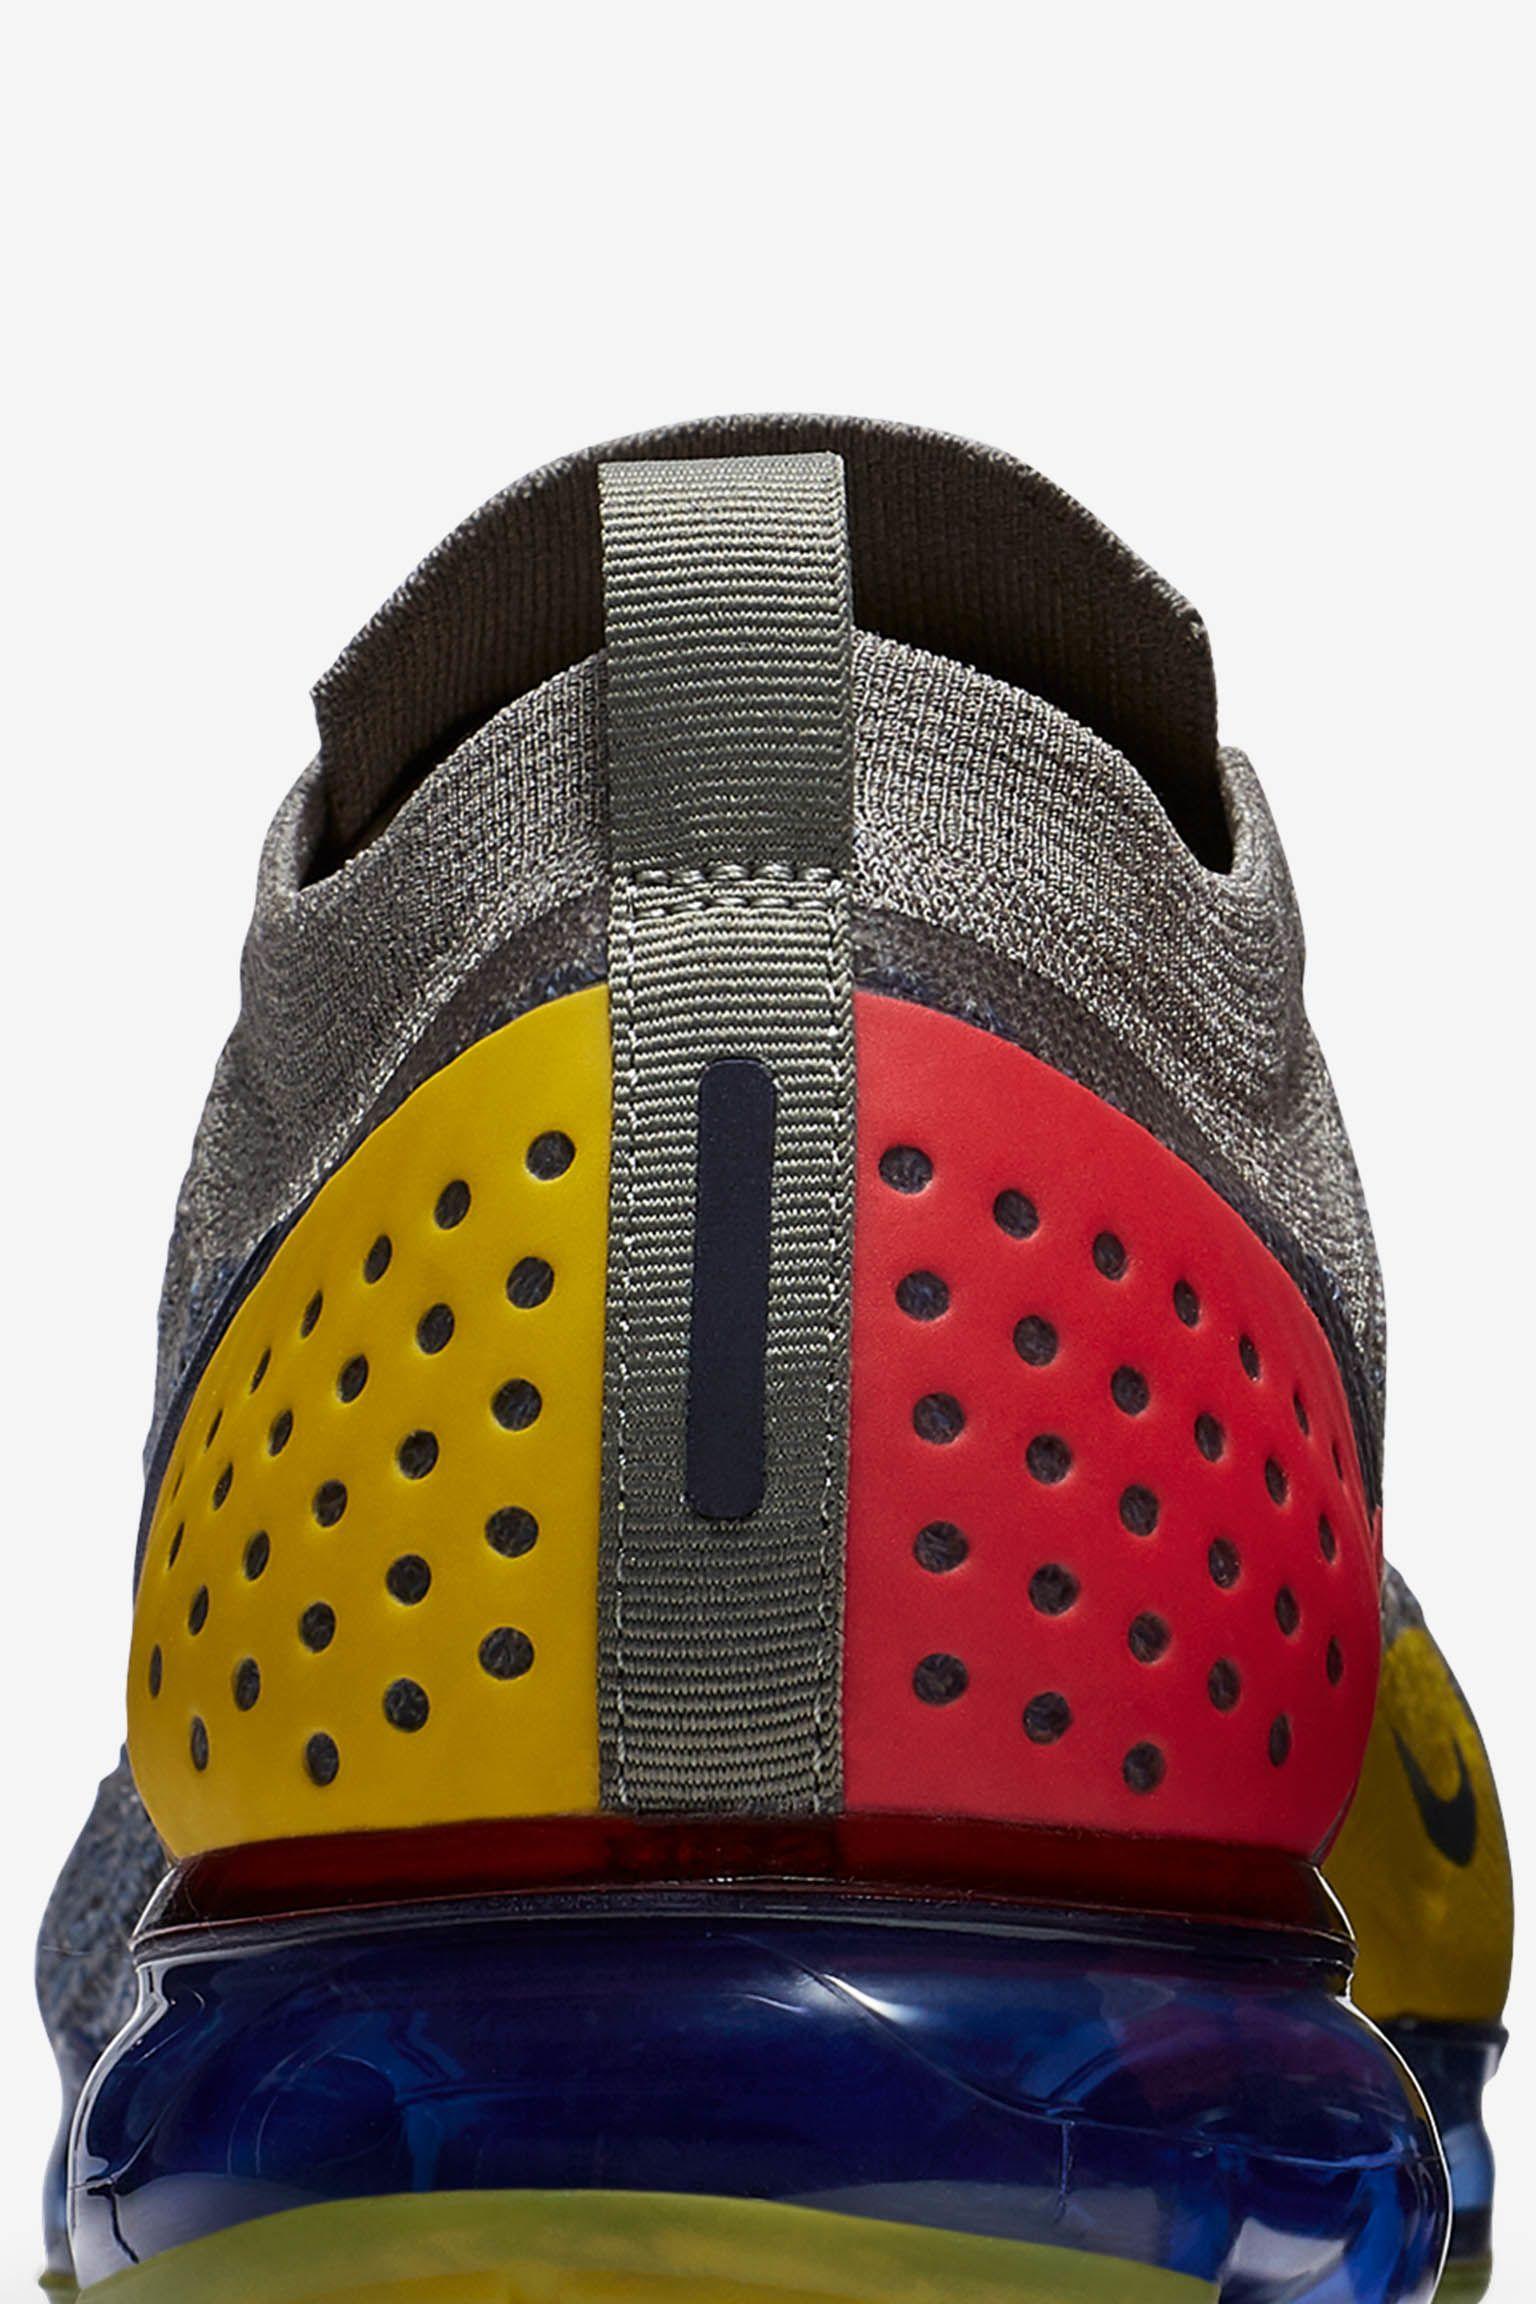 Nike Air Vapormax Moc 2 'Dark Stucco & Midnight Navy' 发布日期